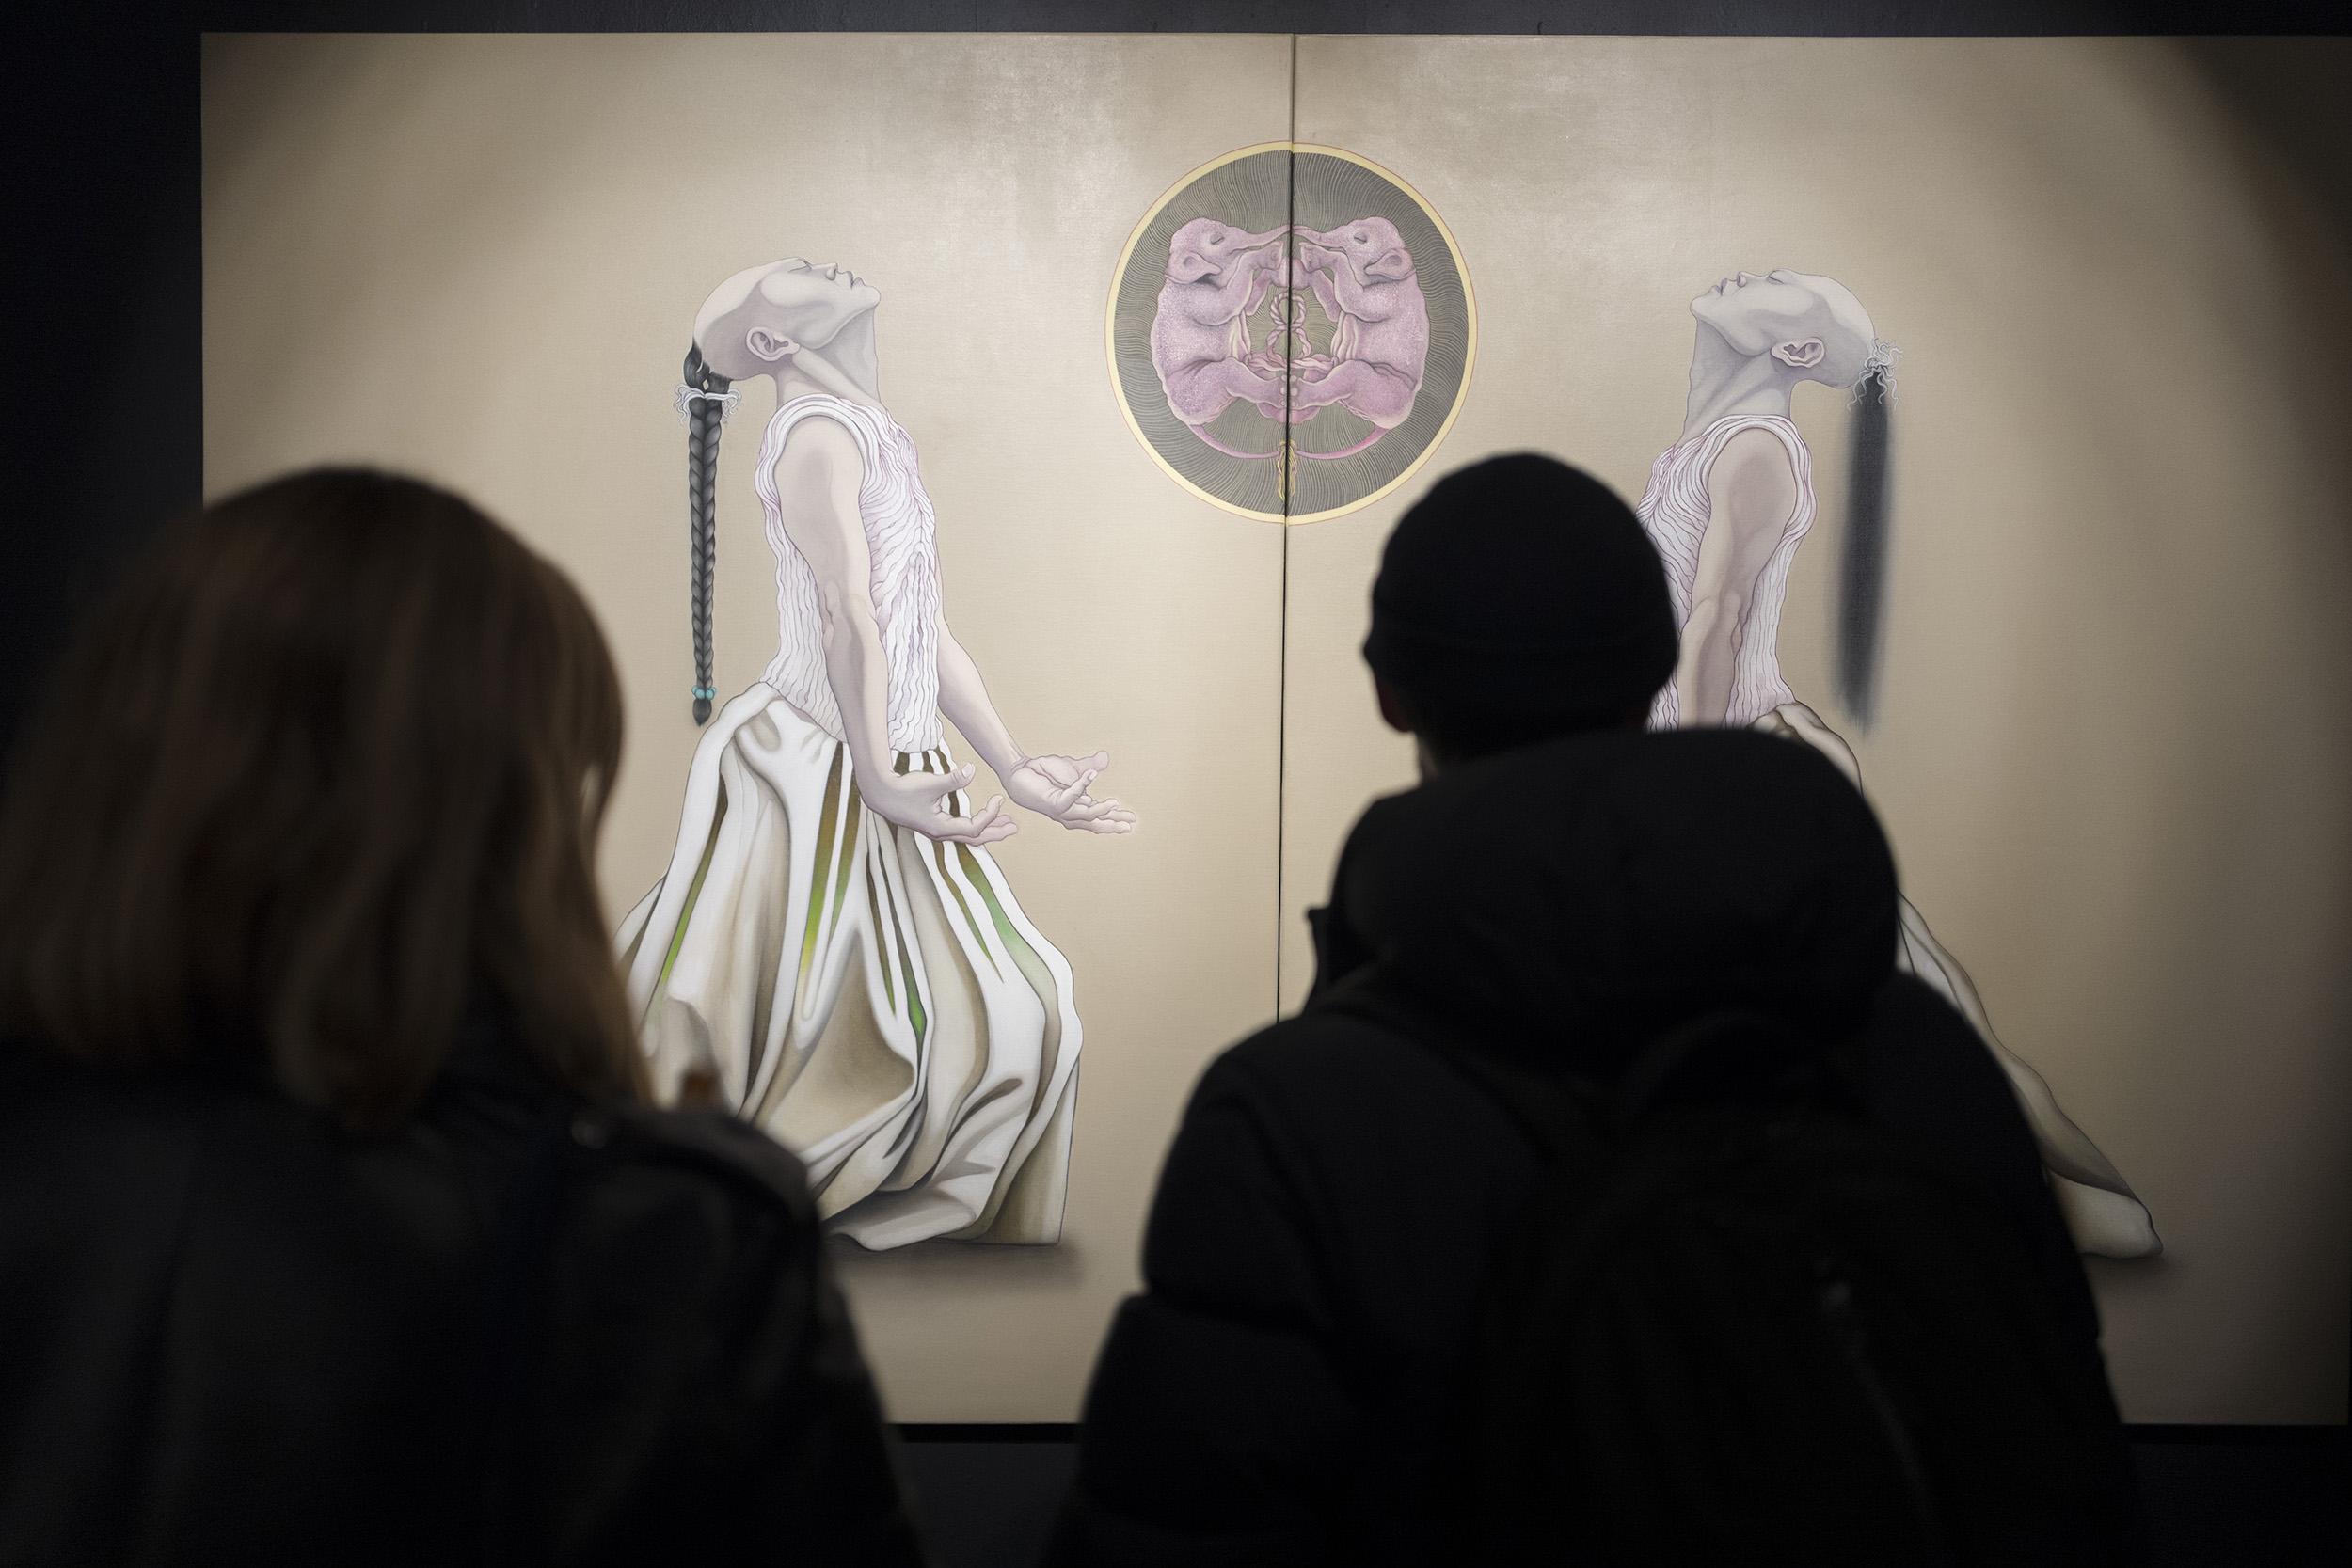 backwoods-gallery-exhibition-phantom-pain-artist-yusk-imai-dante-horoiwa